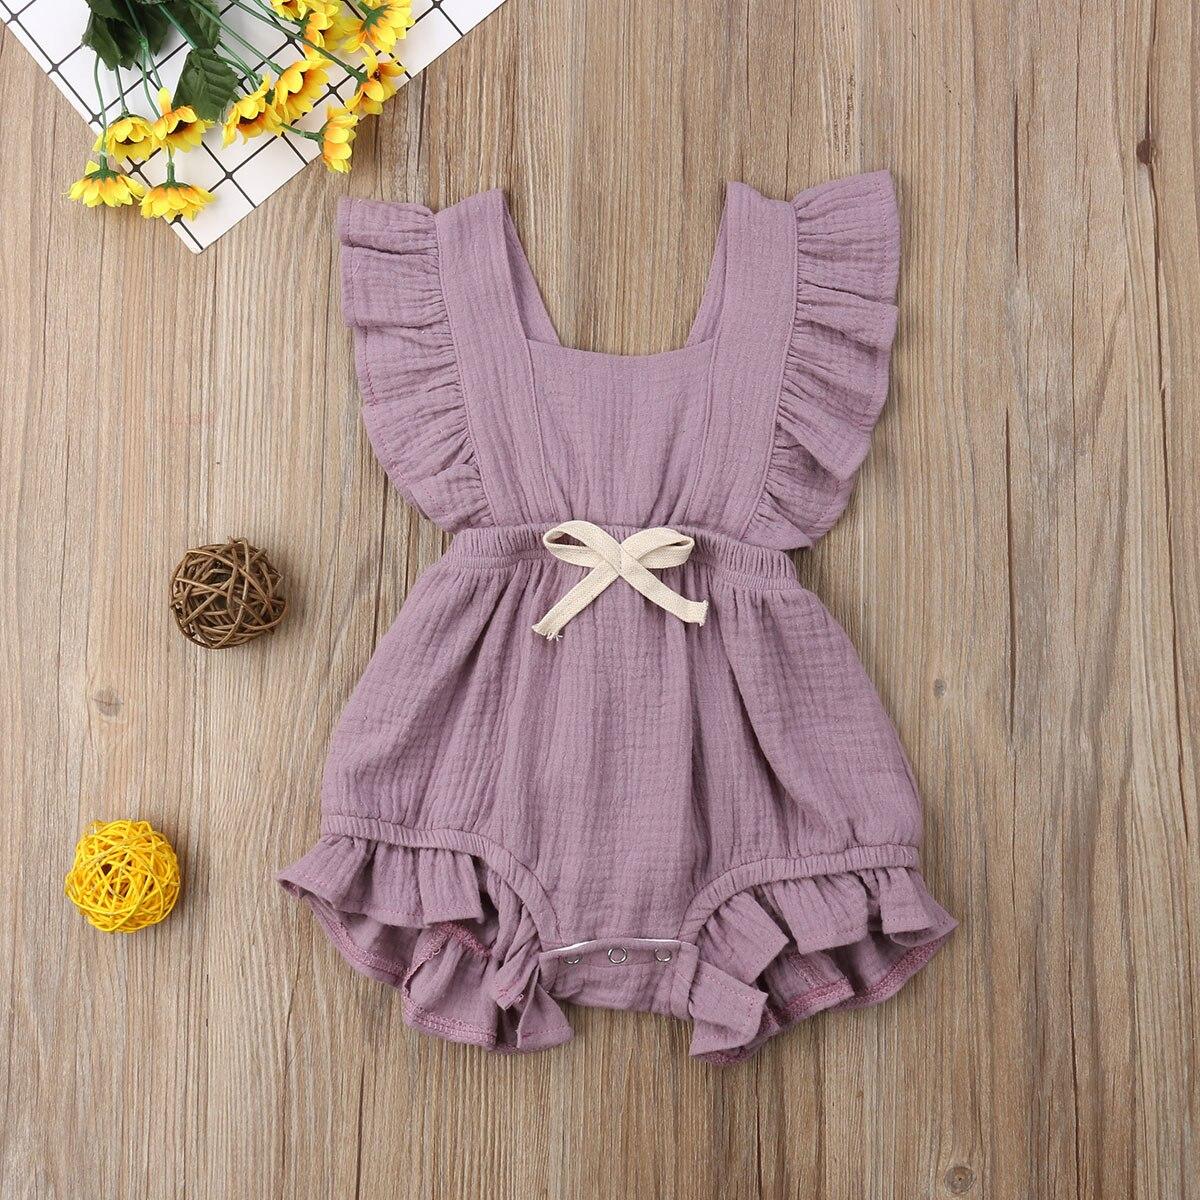 HTB1z56lah2rK1RkSnhJq6ykdpXa8 New Arrivels Baby Girls Ruffle One-Pieces Clothes Summer Newborn Kids Sleeveless Romper Jumpsuit Outfits Sunsuit